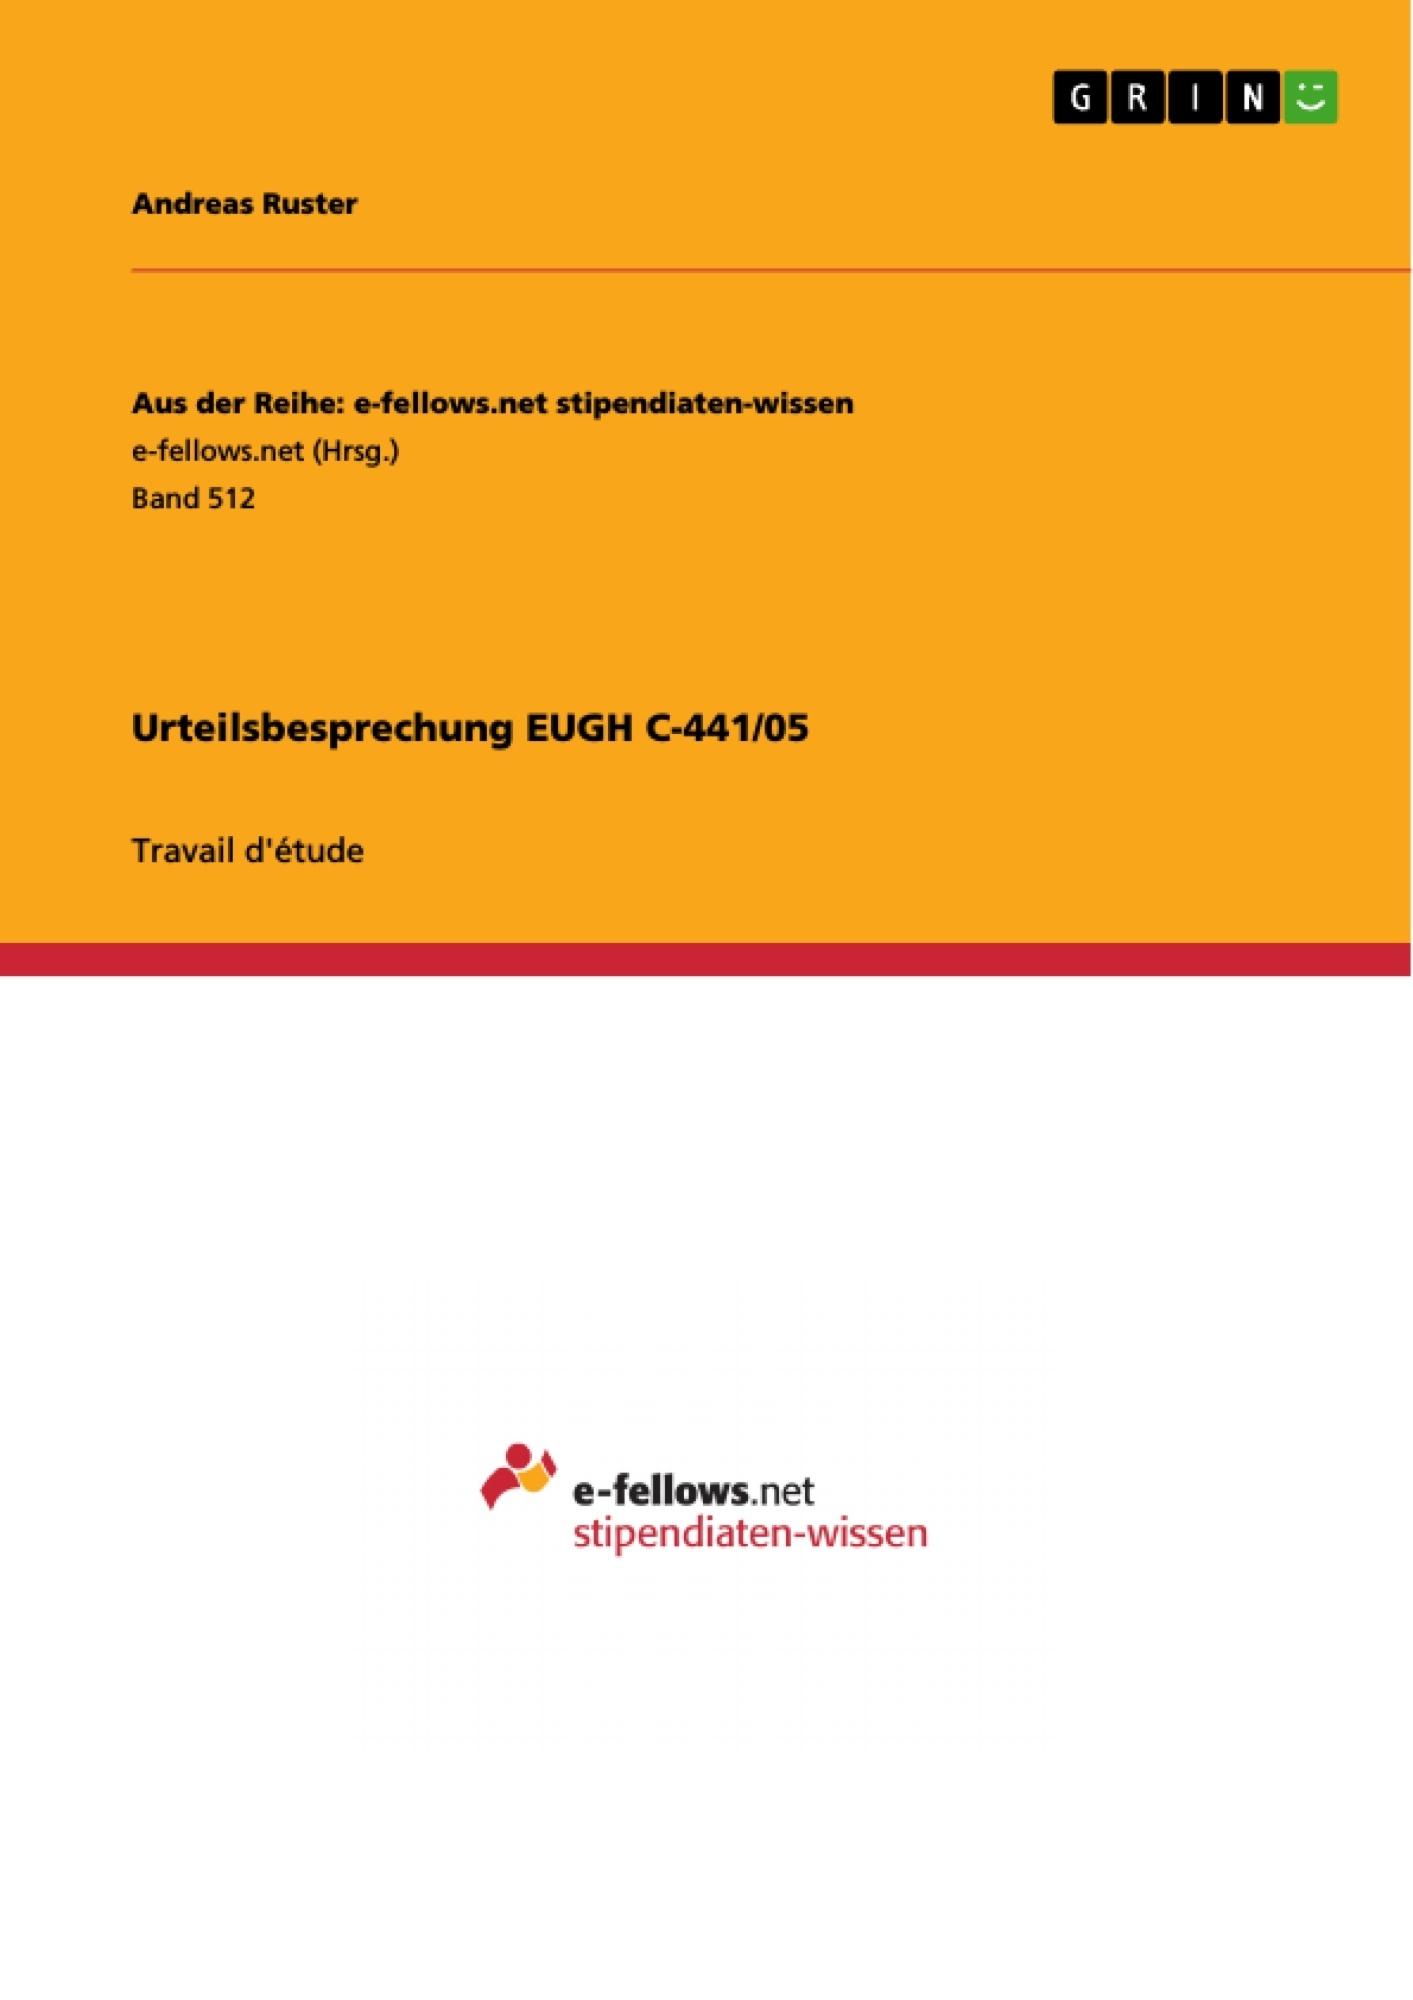 Titre: Urteilsbesprechung EUGH C-441/05